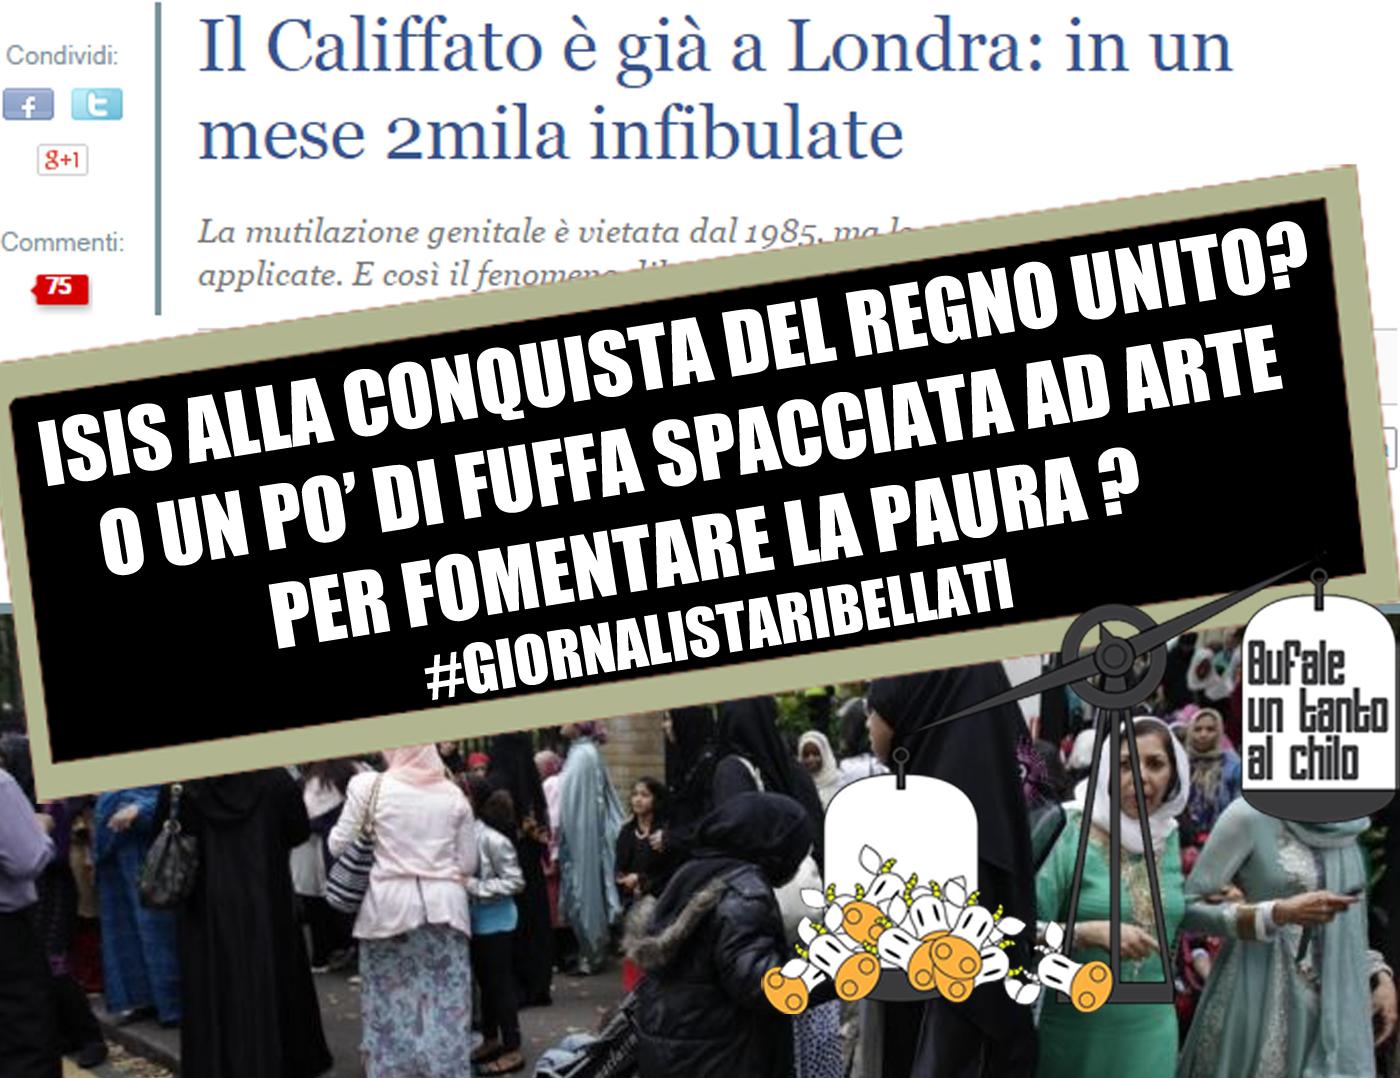 LONDRA-ISIS